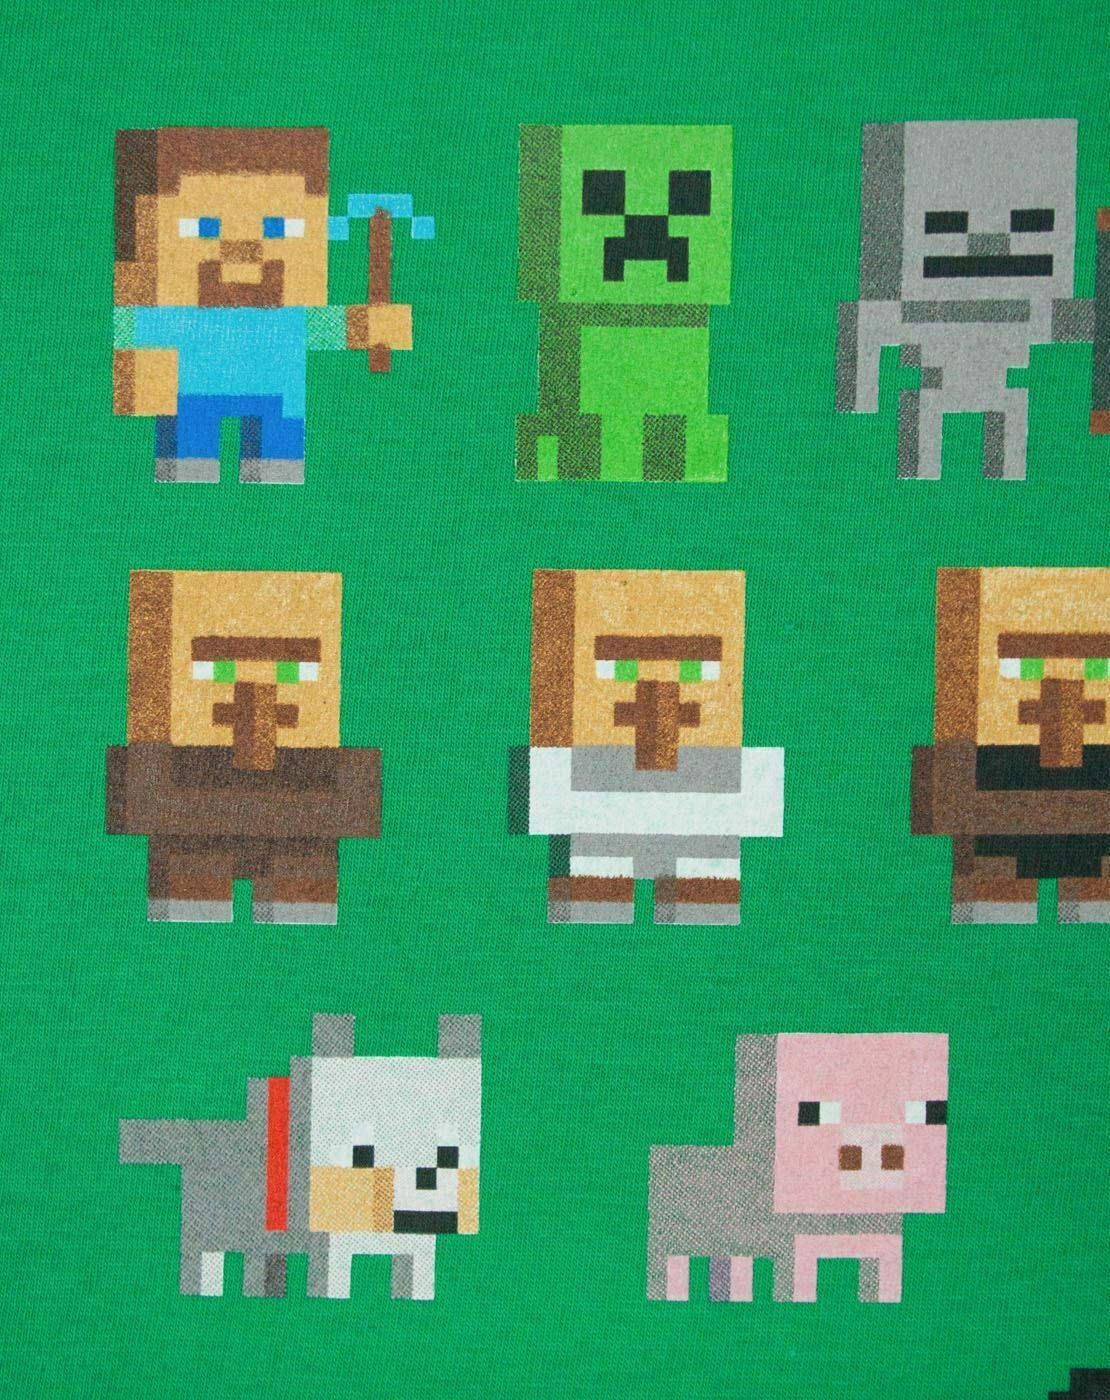 Minecraft Sprites Mojang Boys Kids Green Characters Short Sleeved T-shirt